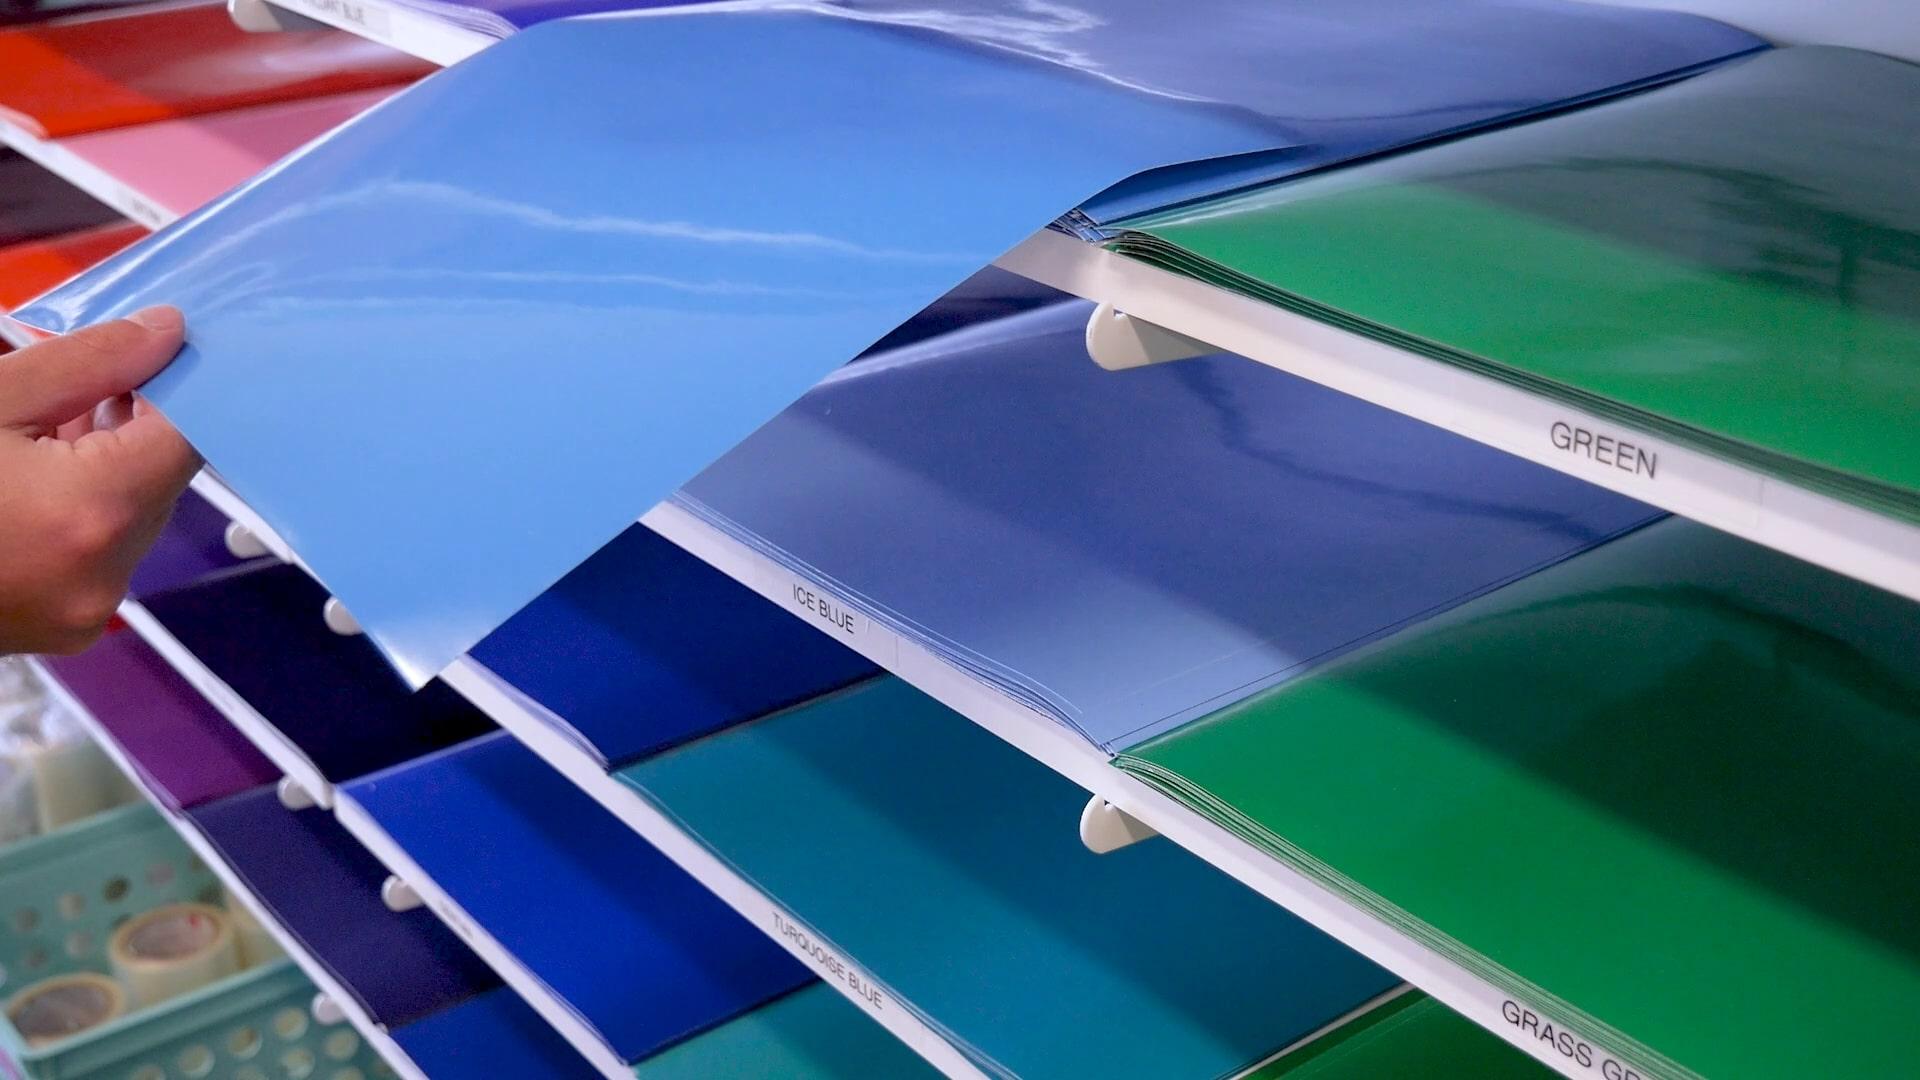 Heat Transfer Vinyl Sheets | Coastal Business Supplies